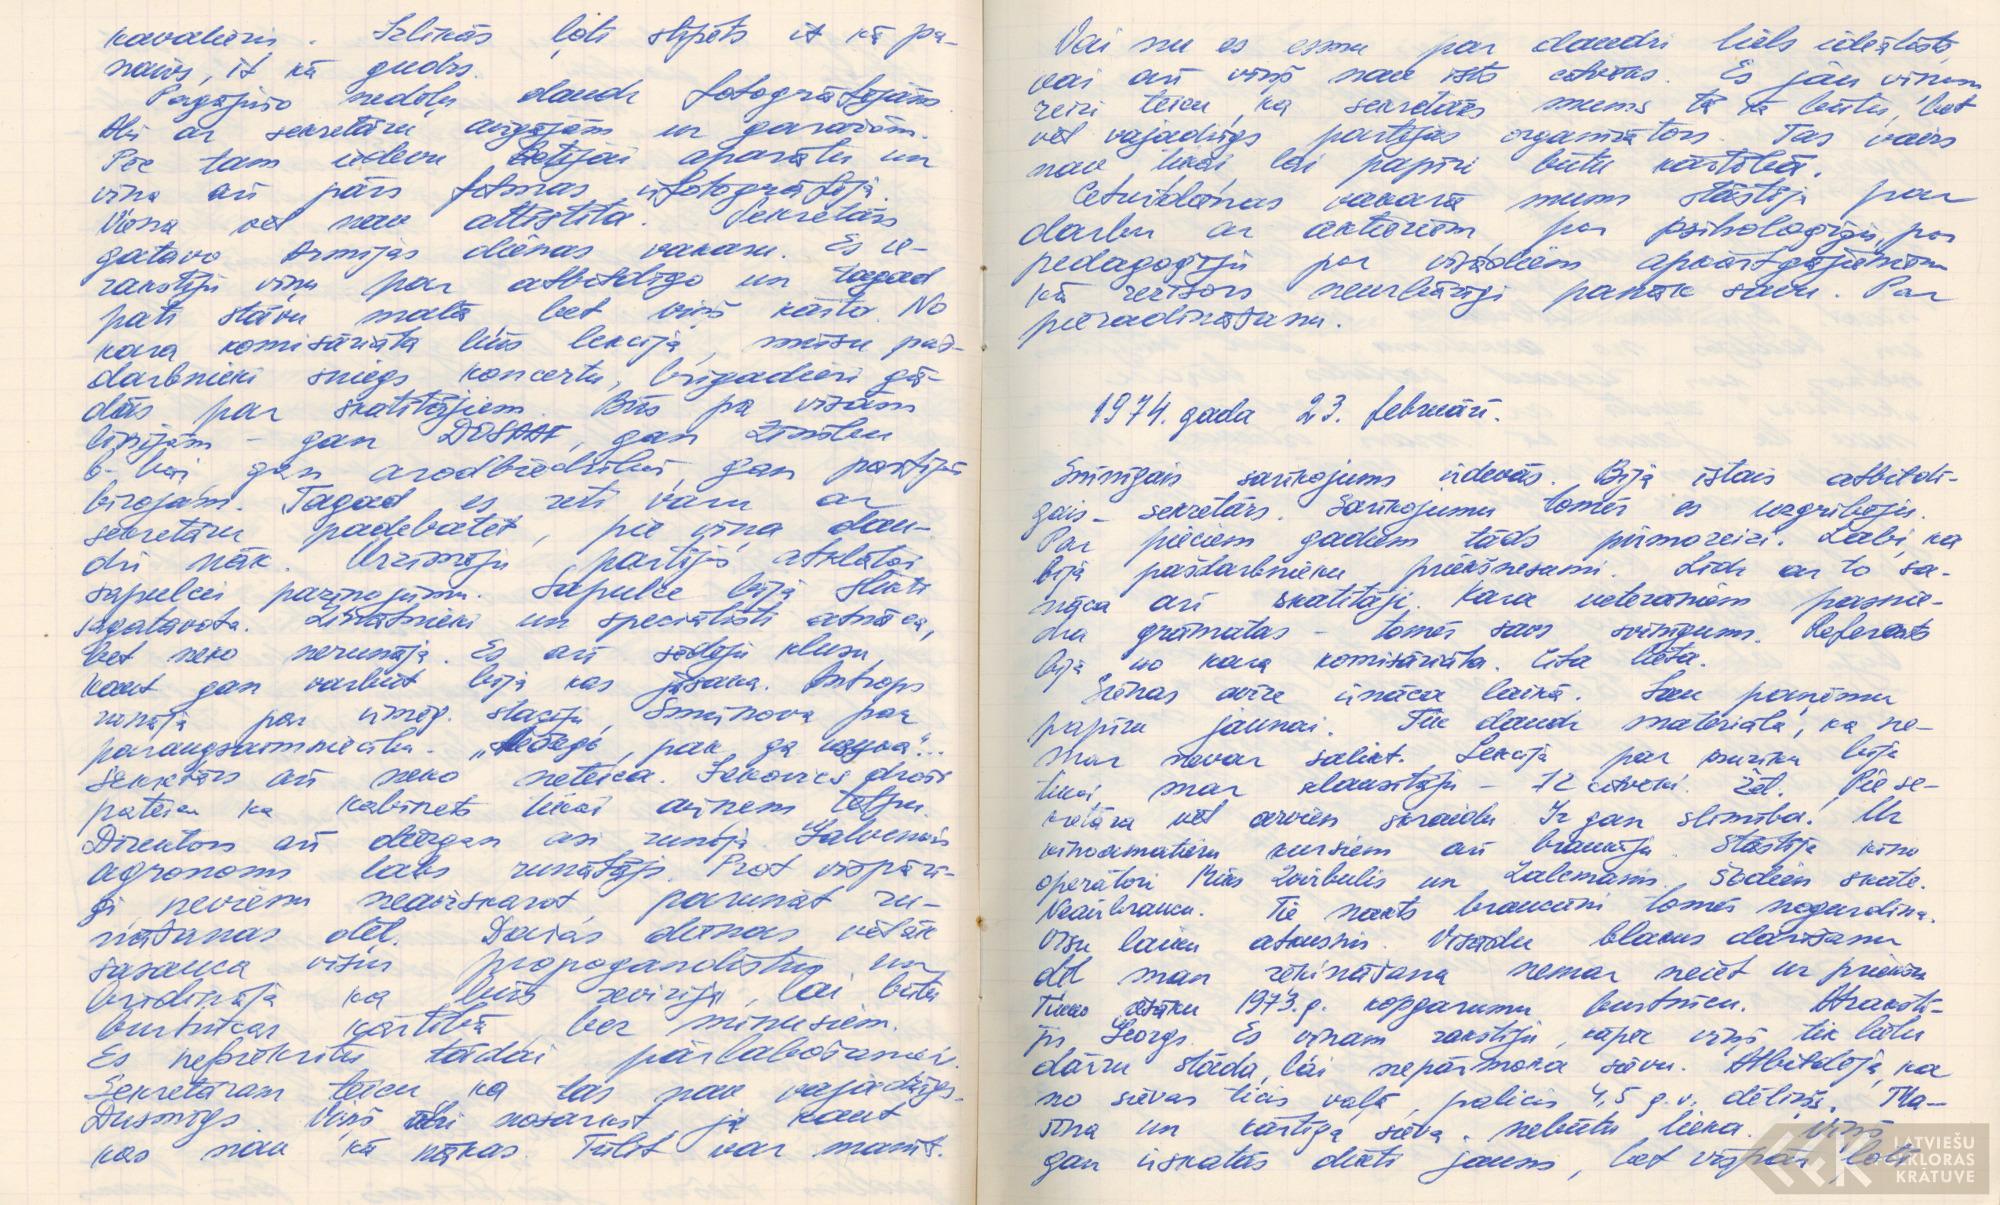 Ak161-Ligitas-Vucenas-dienasgramatas-23-0084